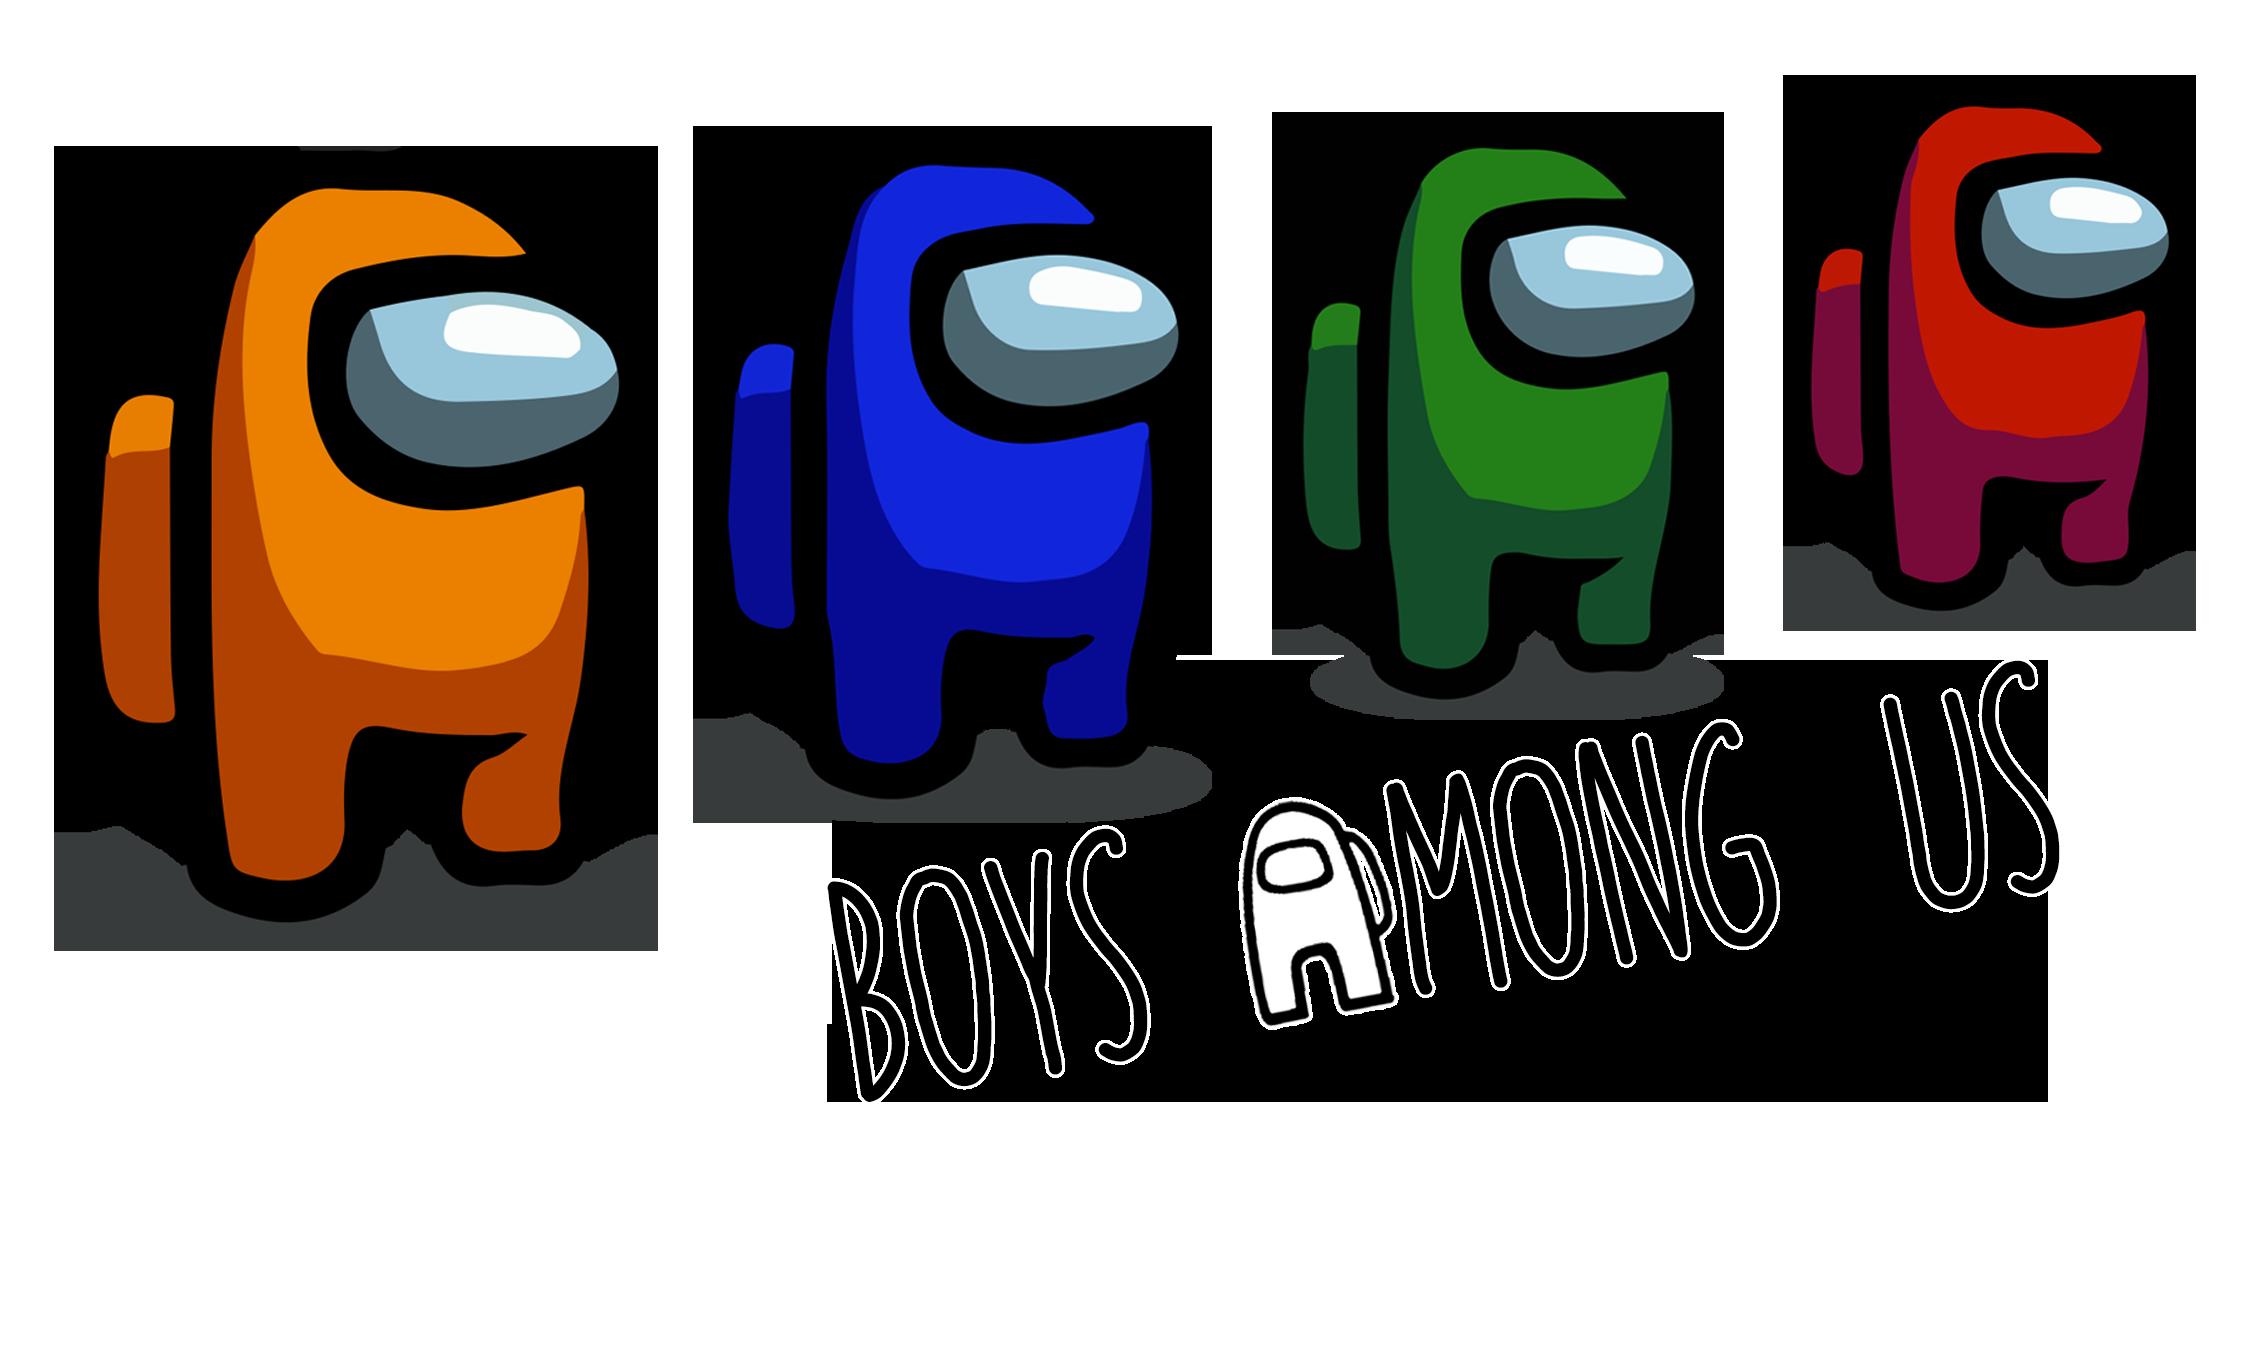 Boys Among Us